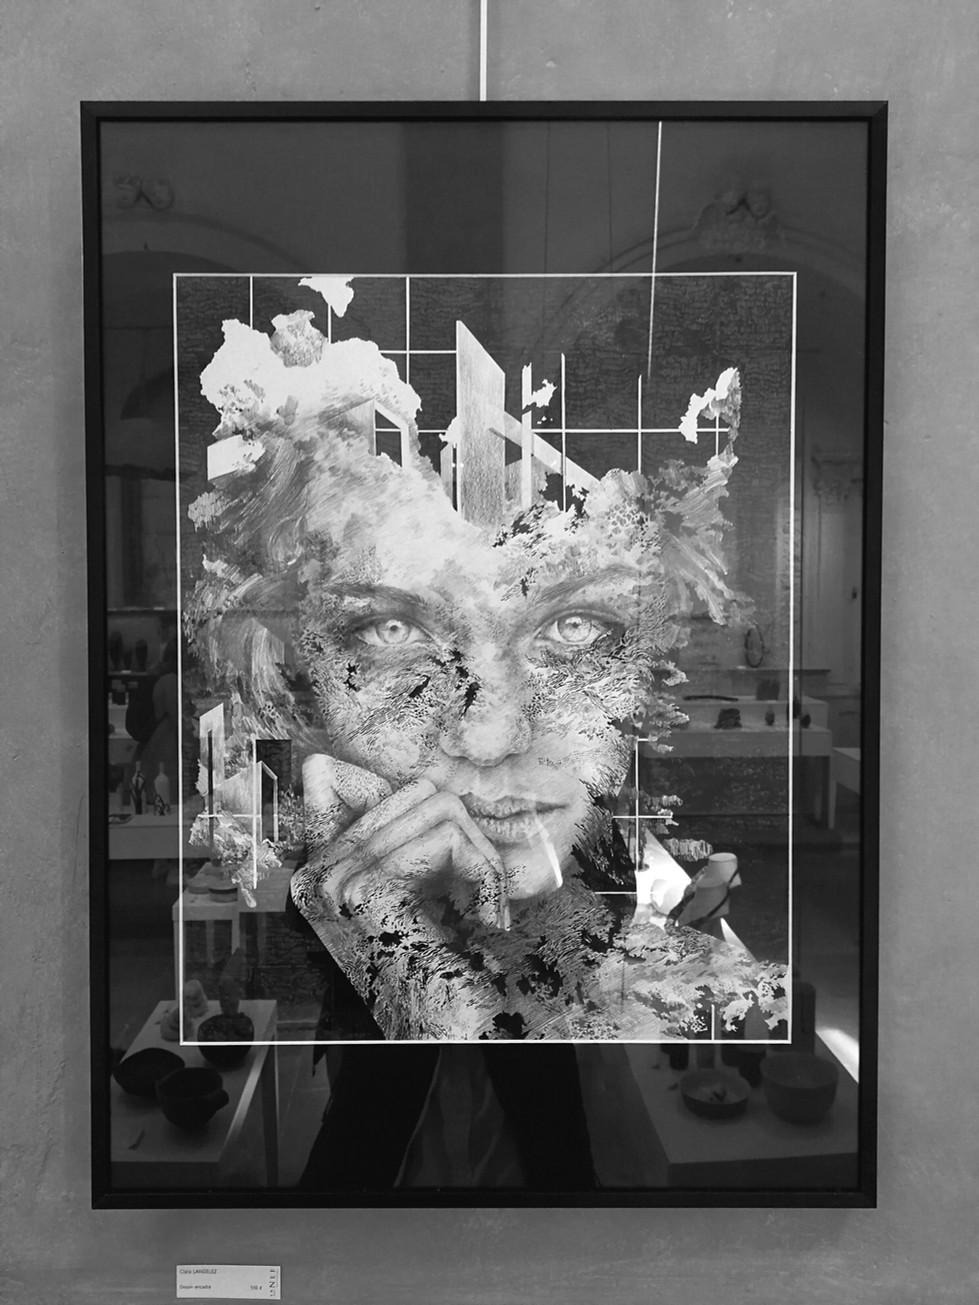 ARTGORA - clara langelez - 2019